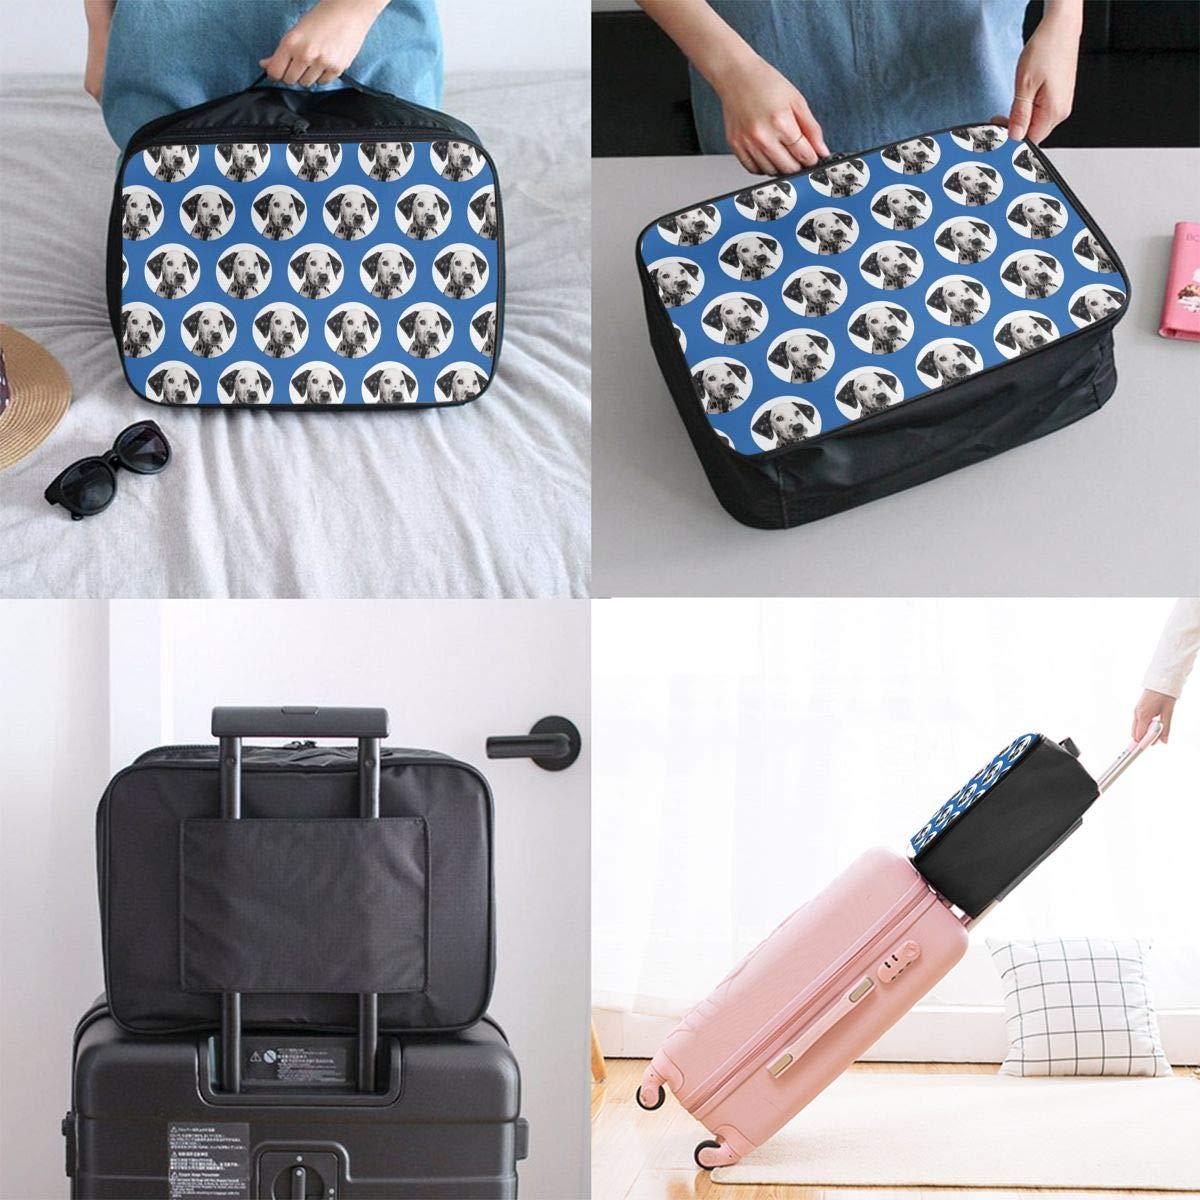 YueLJB Dalmatian Dog Head Circle Lightweight Large Capacity Portable Luggage Bag Travel Duffel Bag Storage Carry Luggage Duffle Tote Bag